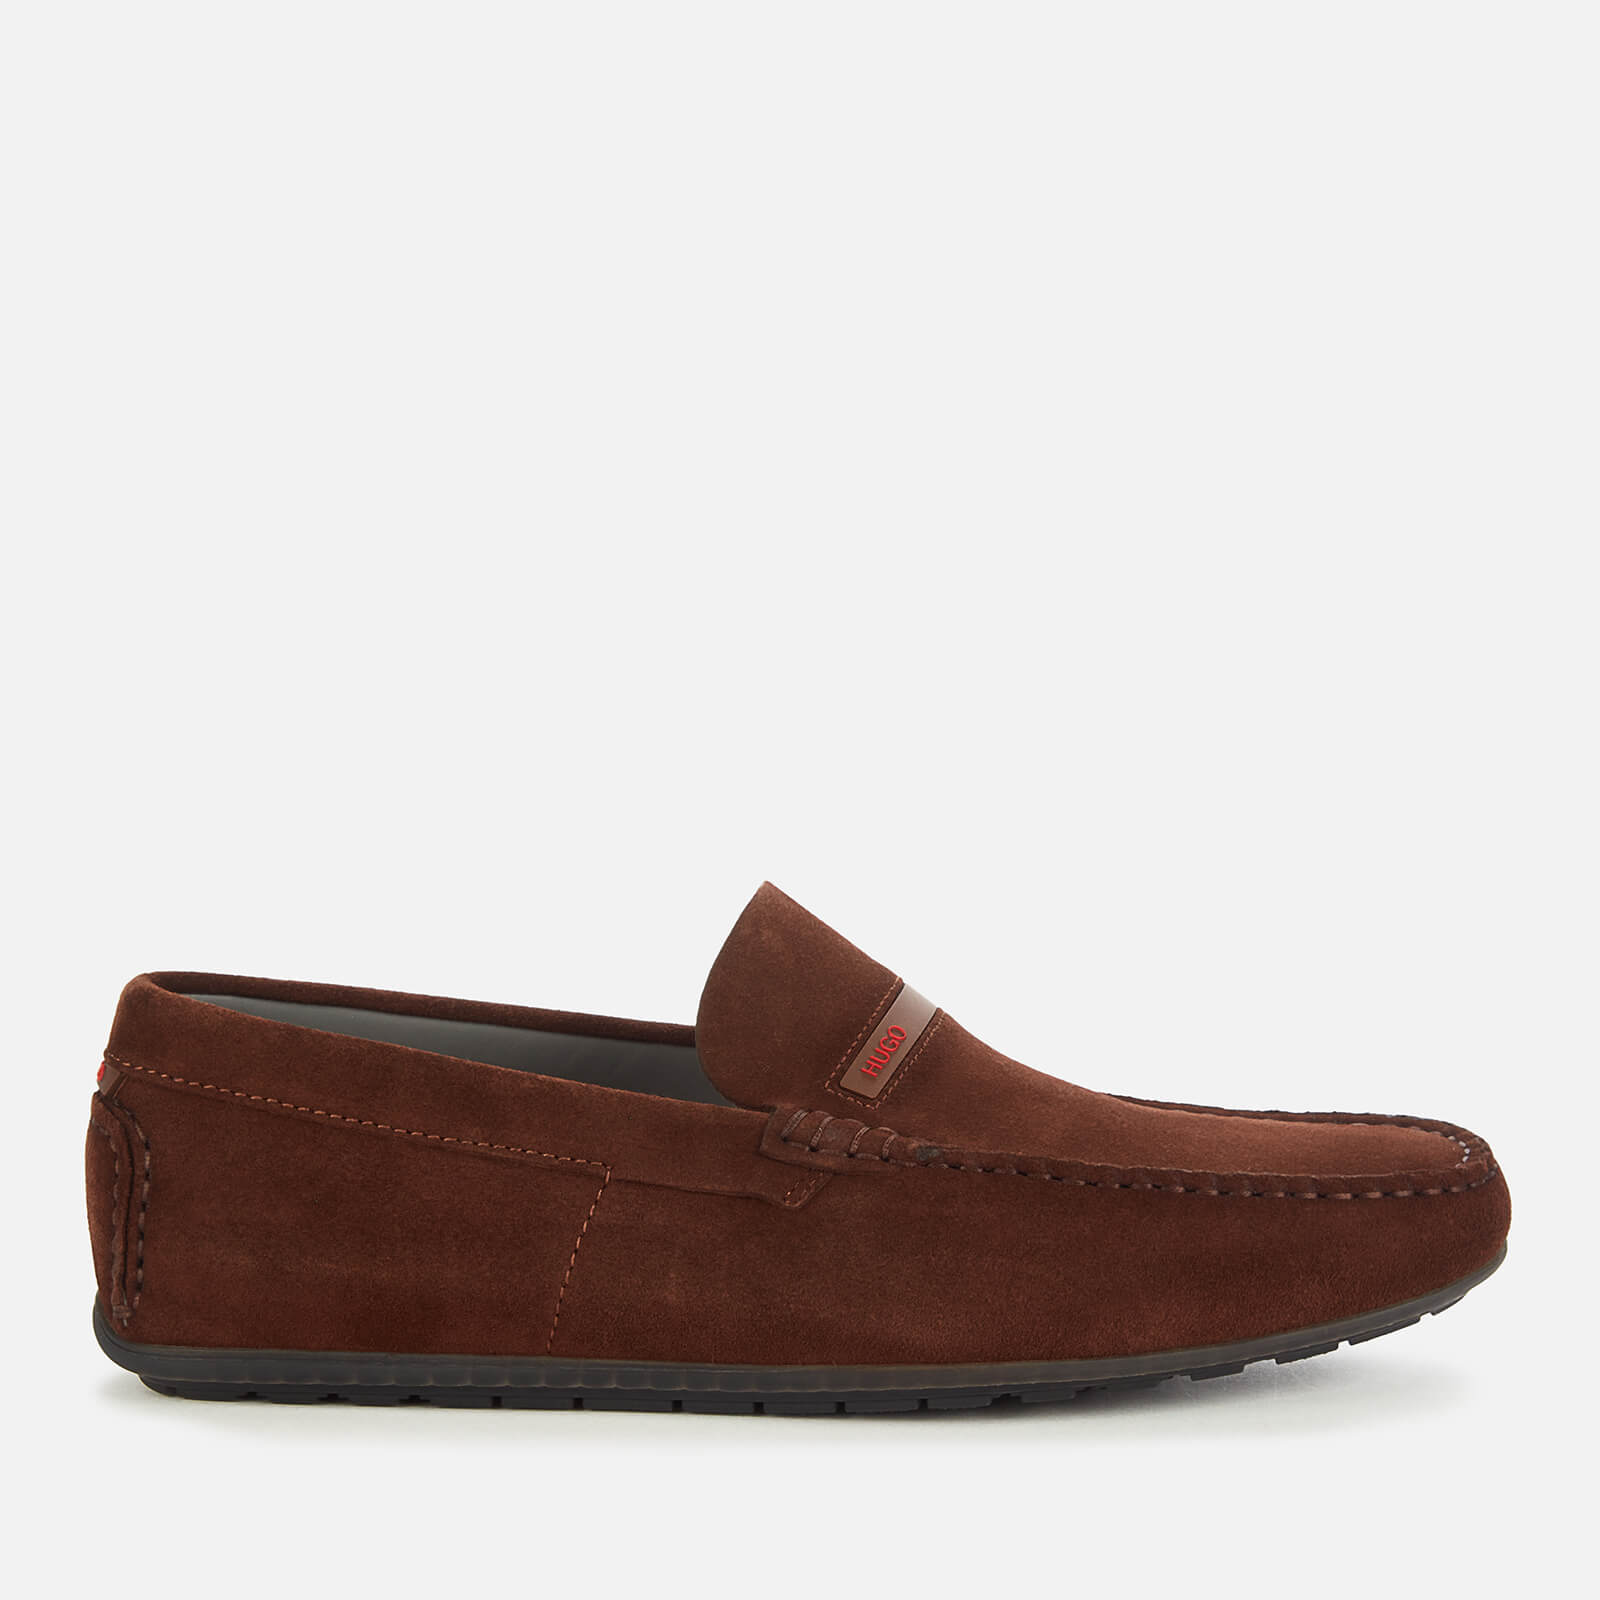 HUGO Men's Dandy Moc Suede Driving Shoes - Dark Brown - UK 11